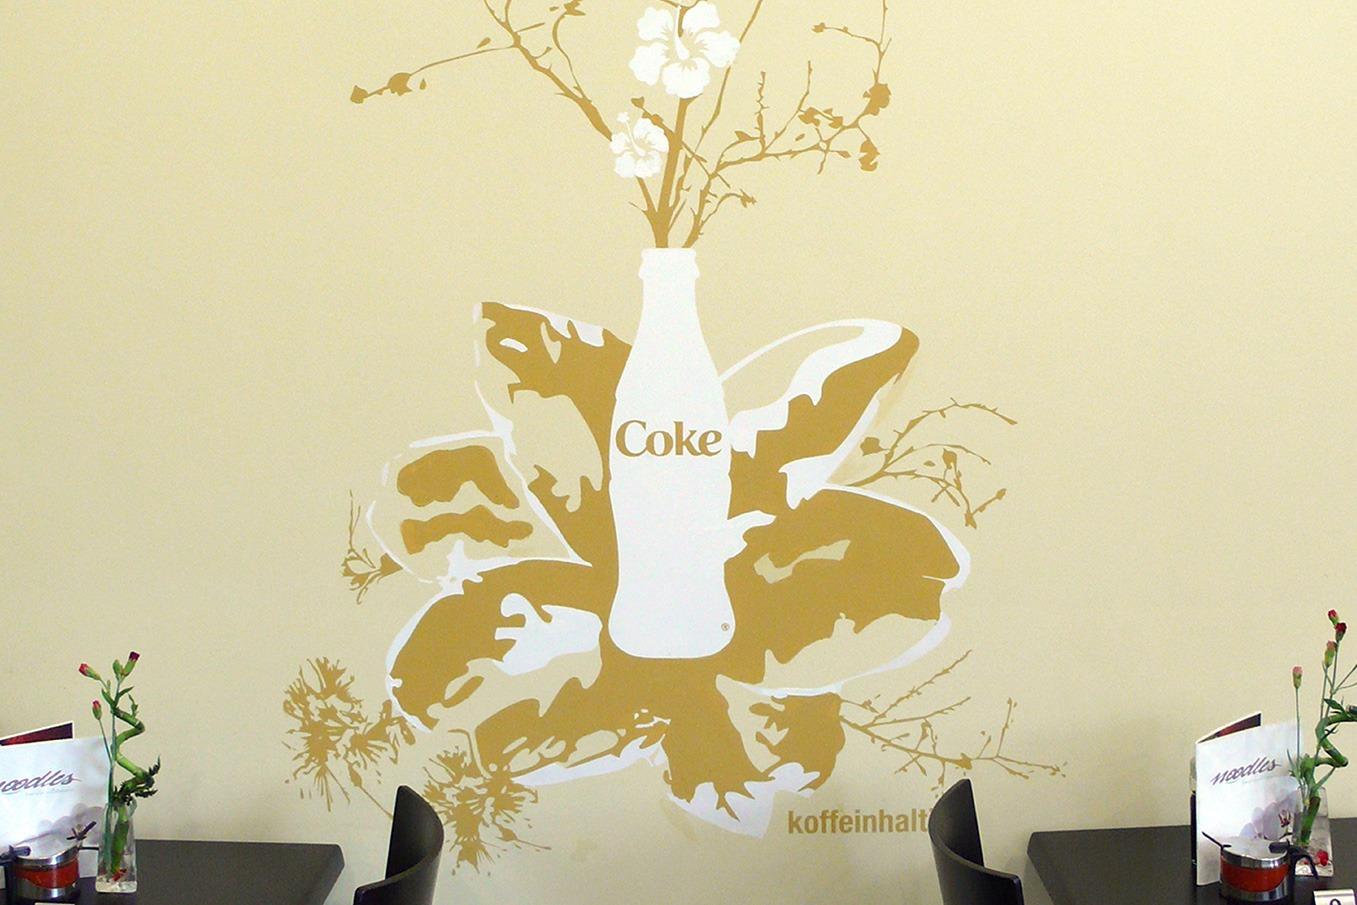 graffitiauftrag-graffitikuenstler-artmos4-Noodles_Wiesbaden_2007_Flasche_Pflanzen_innen_beige_gelb_gold_Folie_Getränke